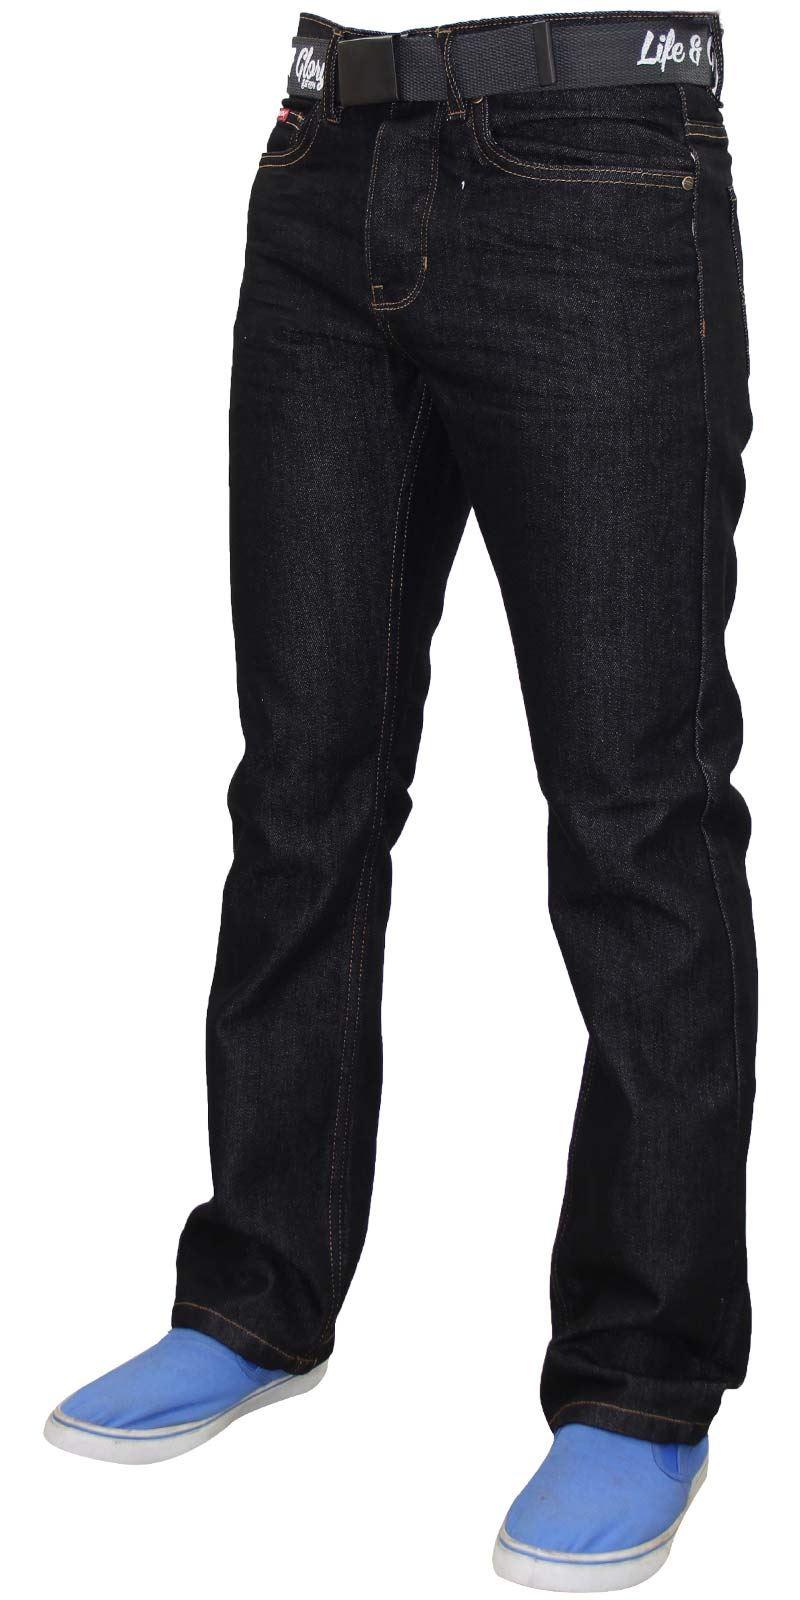 Mens-Regular-Fit-Jeans-Straight-Leg-Denim-Pants-Casual-Trousers-With-Free-Belt thumbnail 4